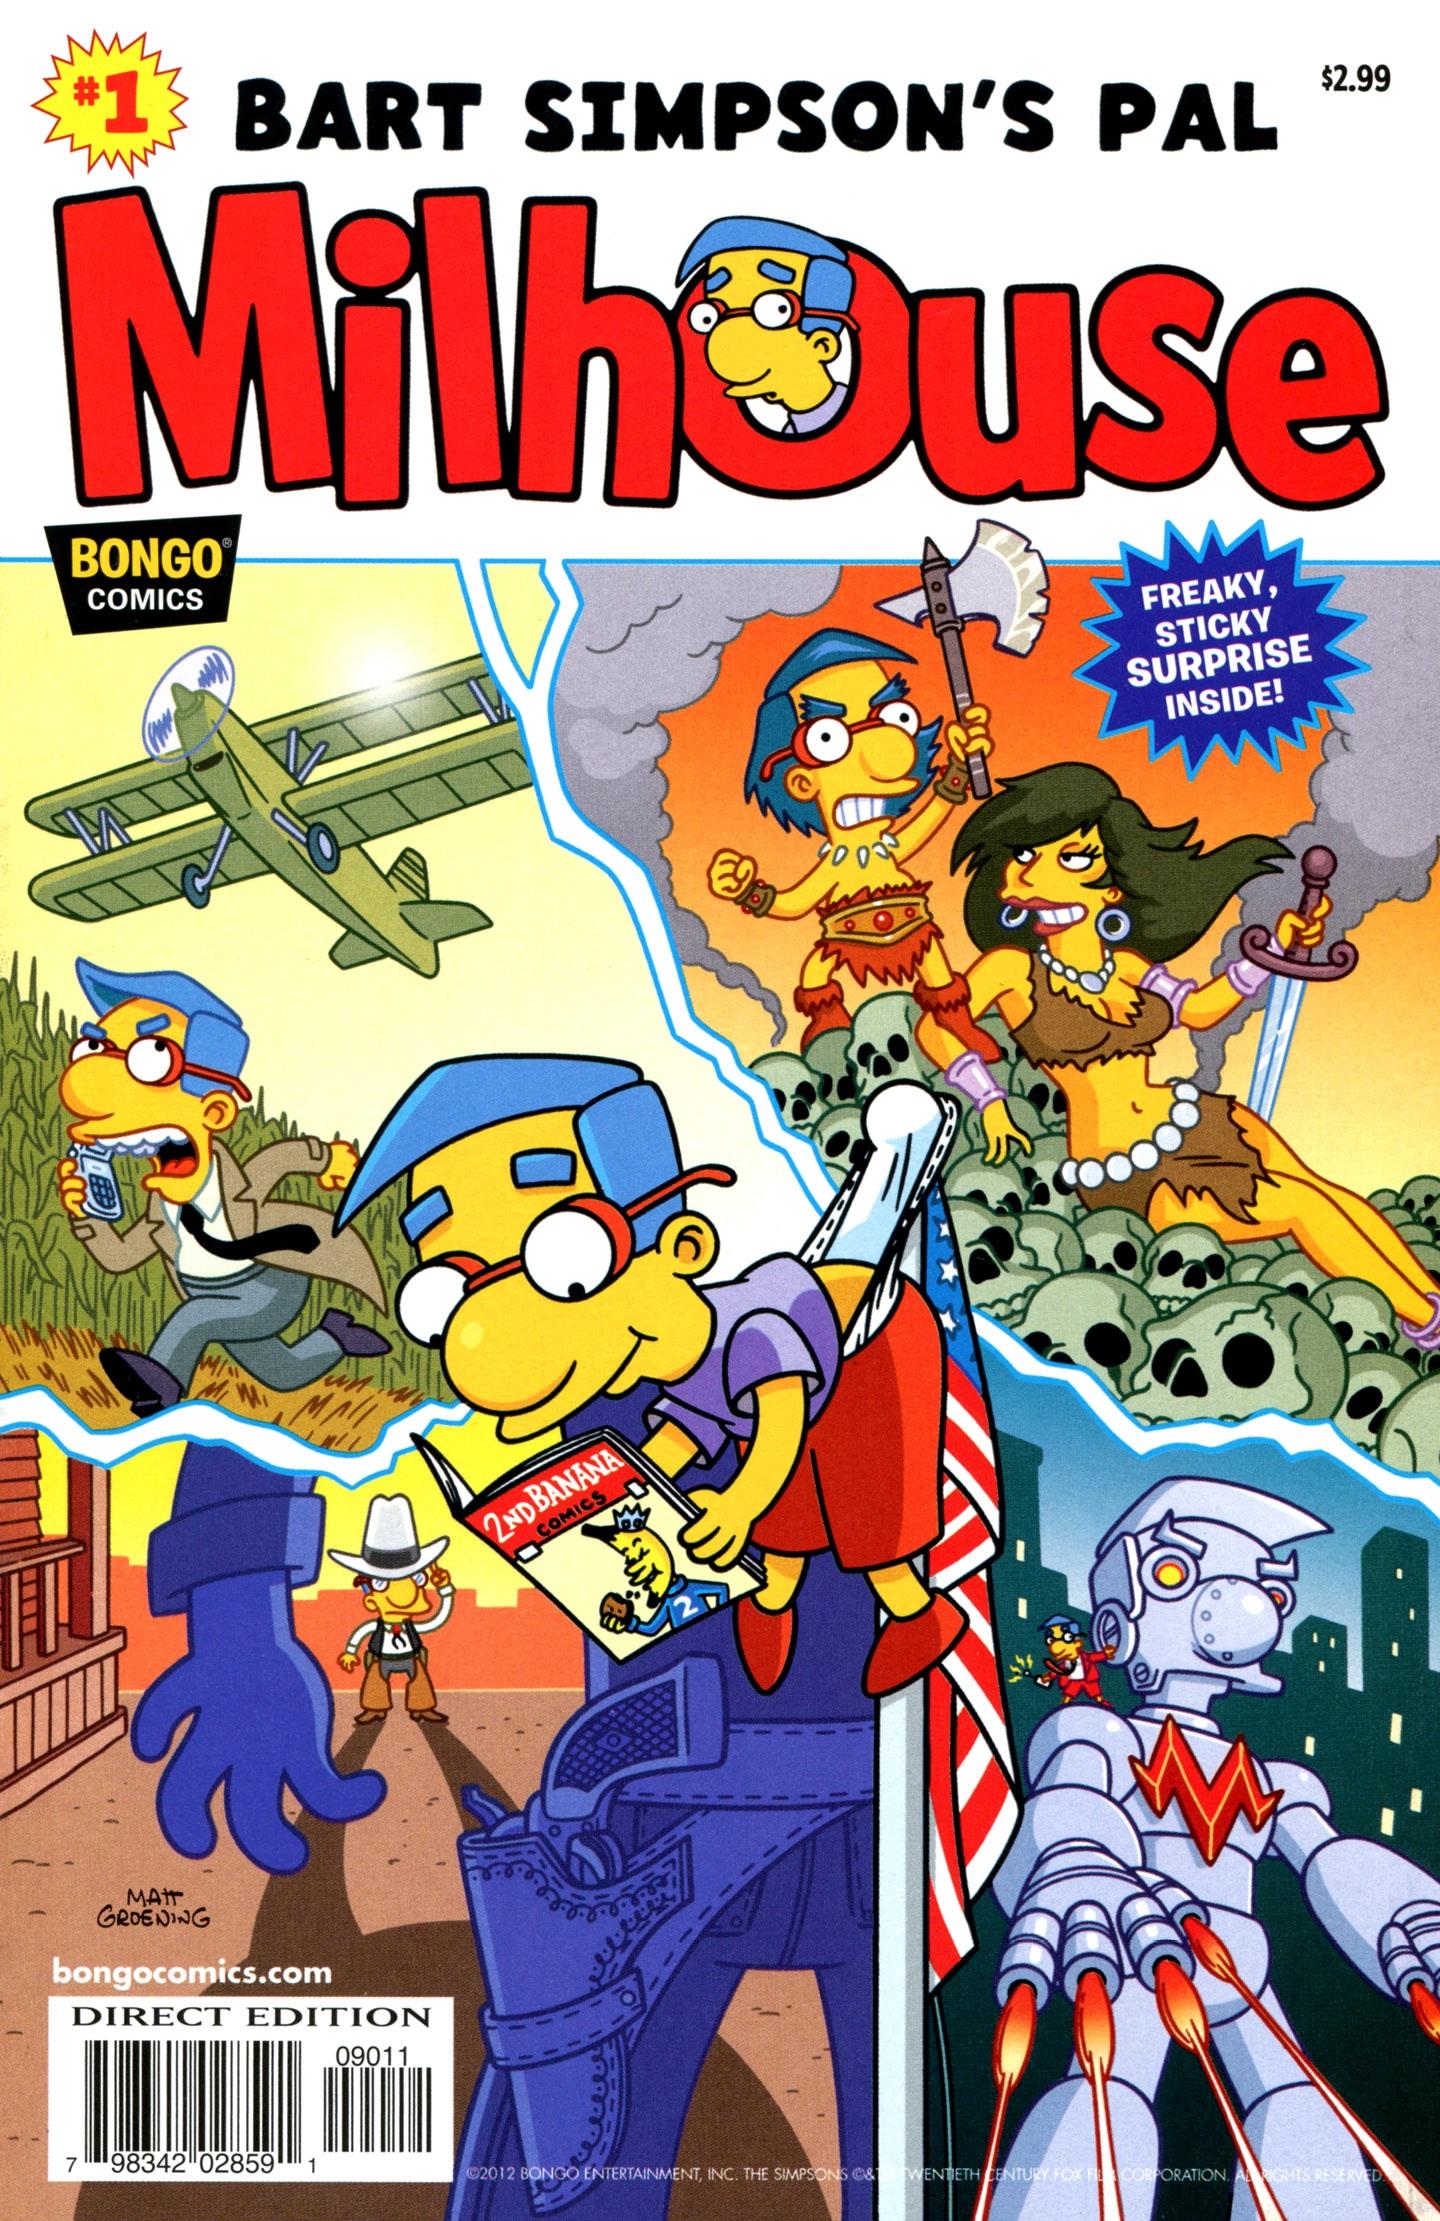 Bart simpson 39 s pal milhouse simpsons wiki fandom powered by wikia - Bart et milhouse ...